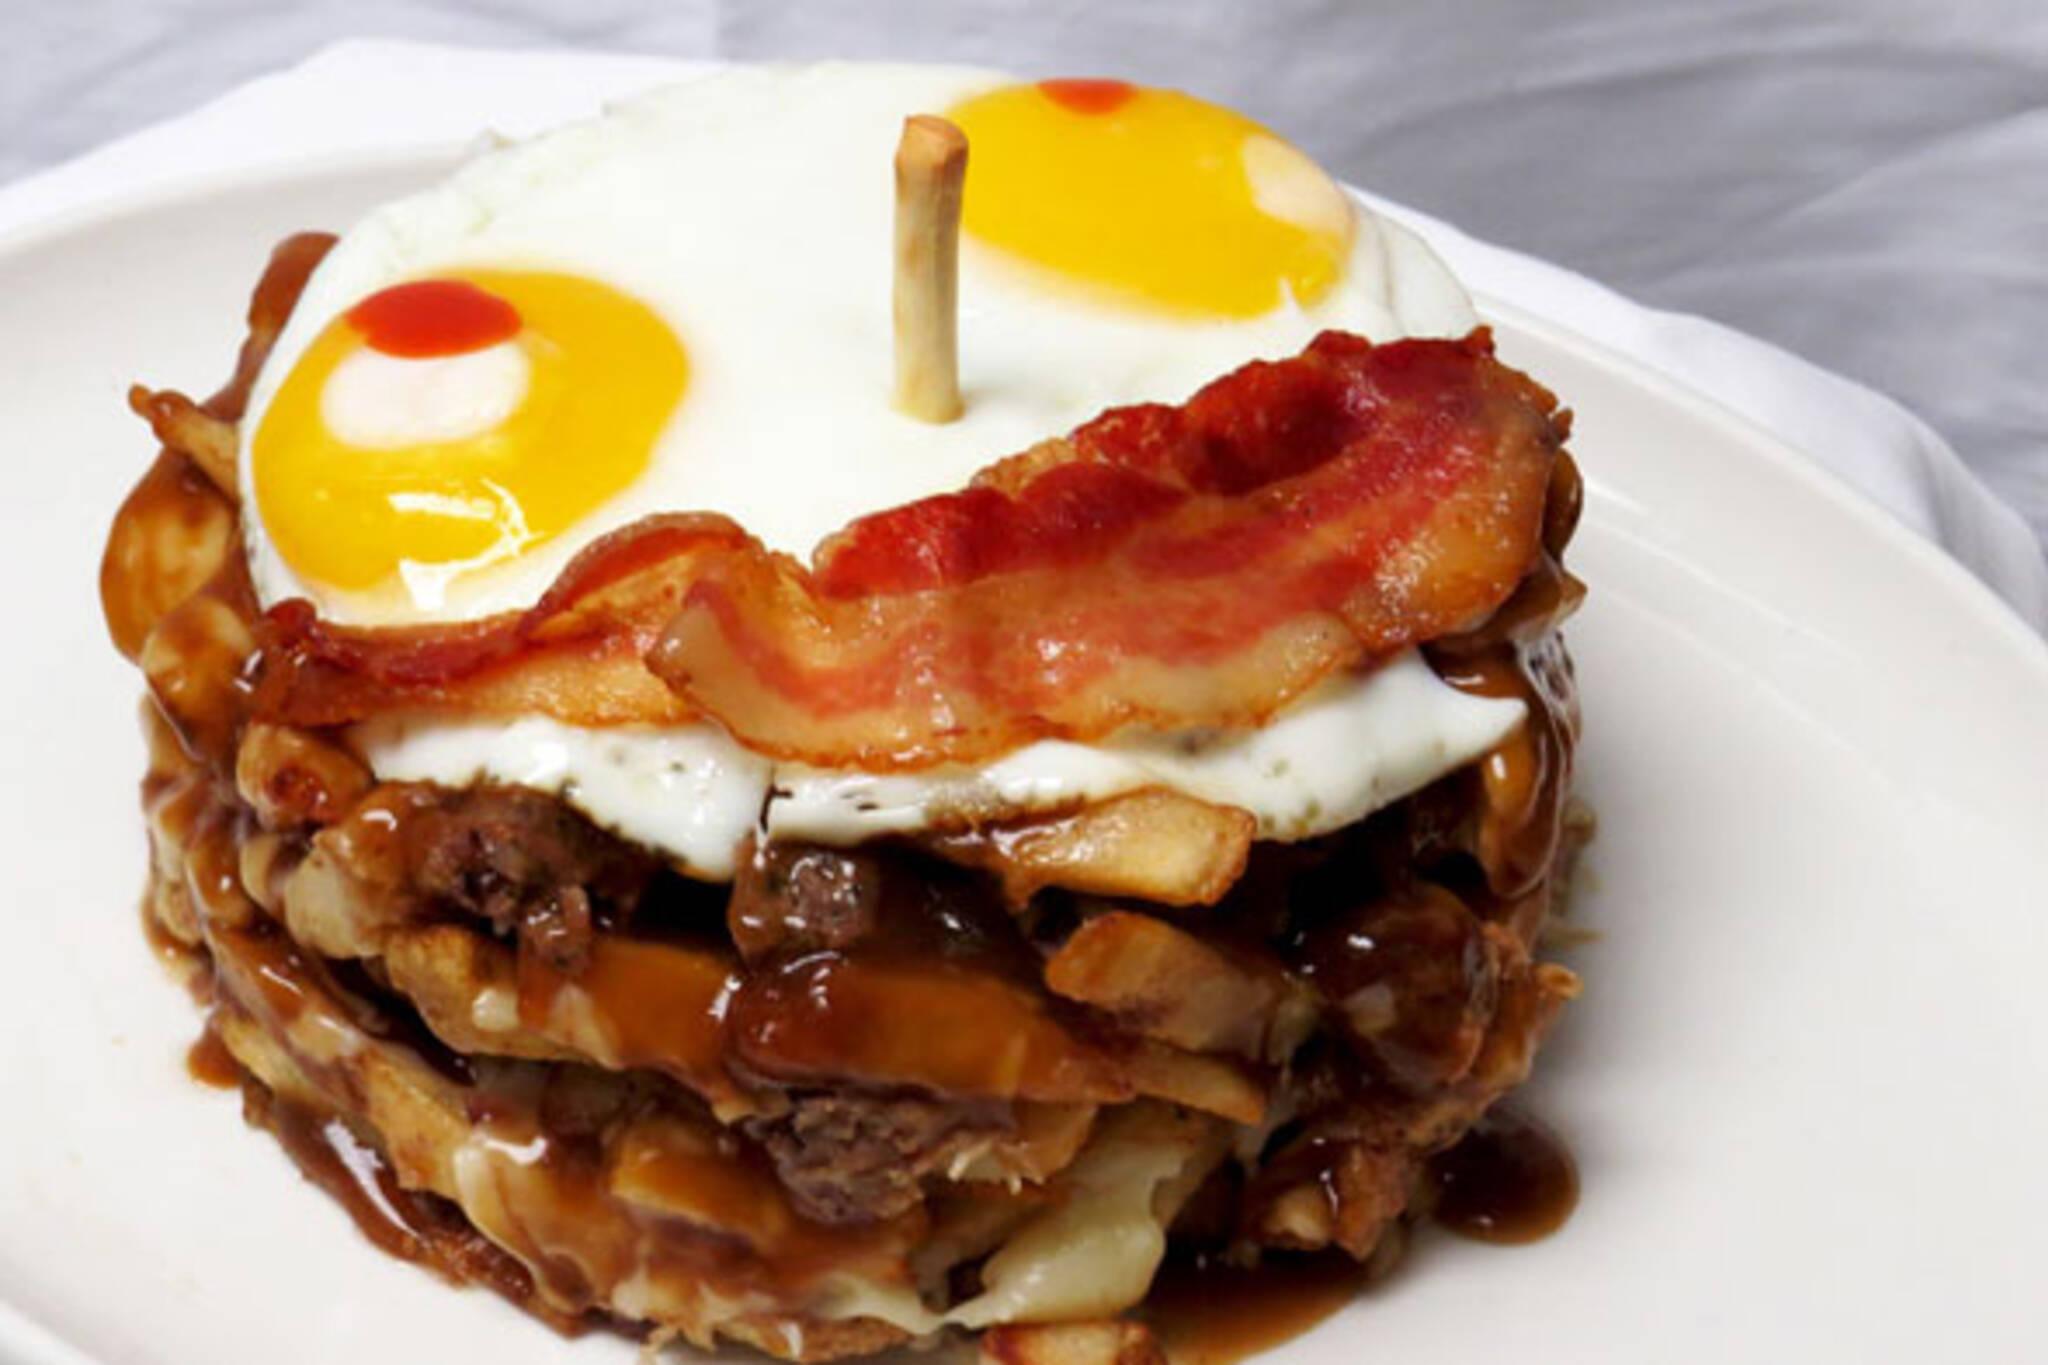 breakfast poutine